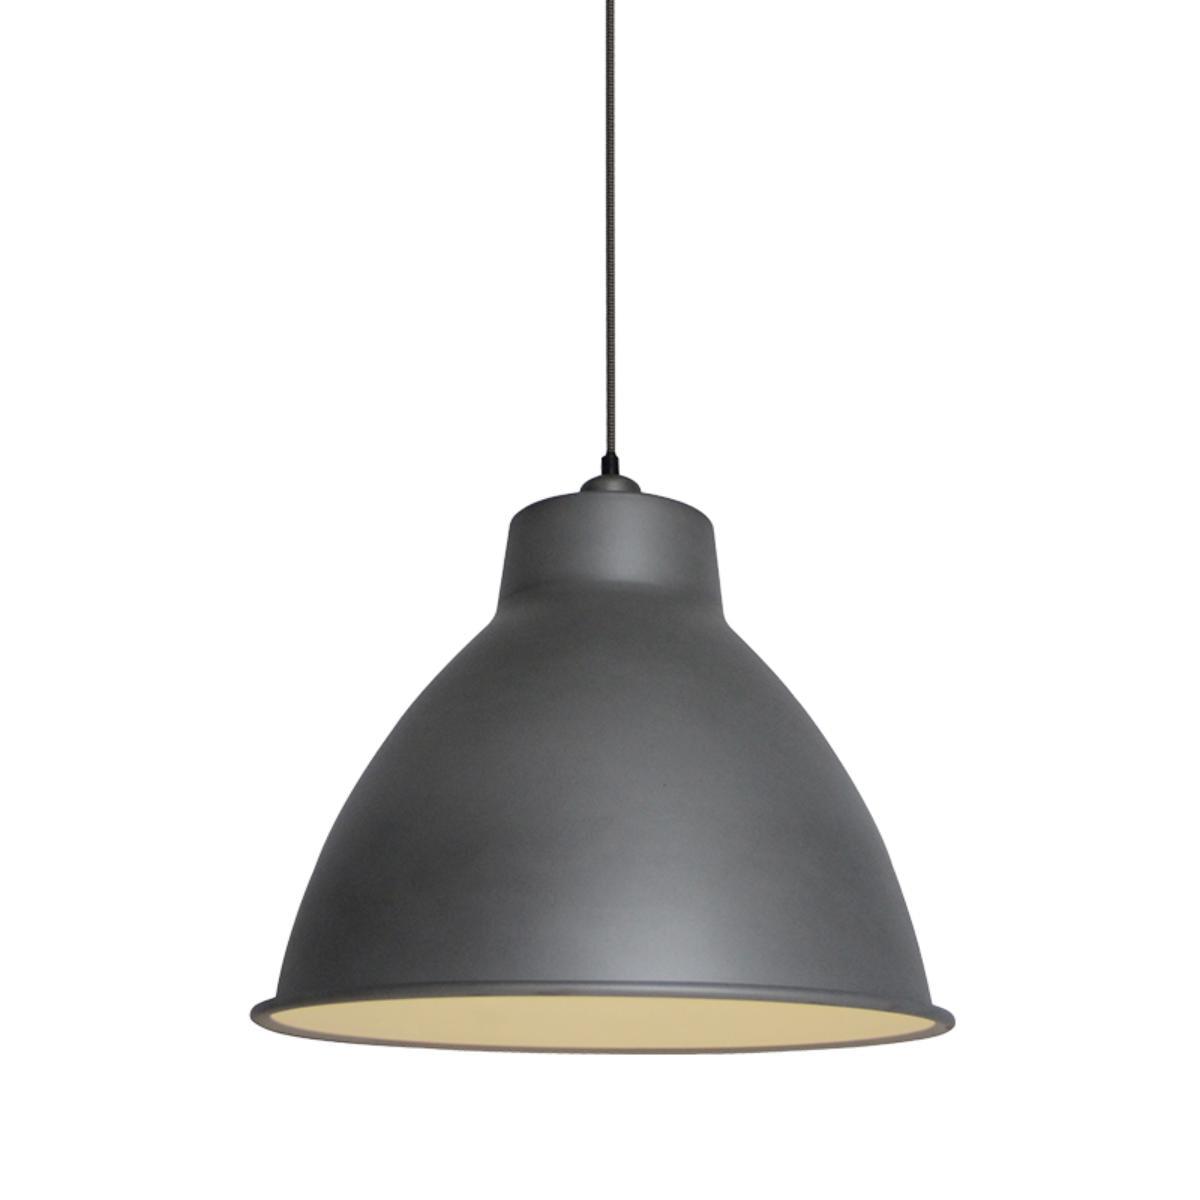 LABEL51 hanglamp 'Dome', kleur Burned Steel